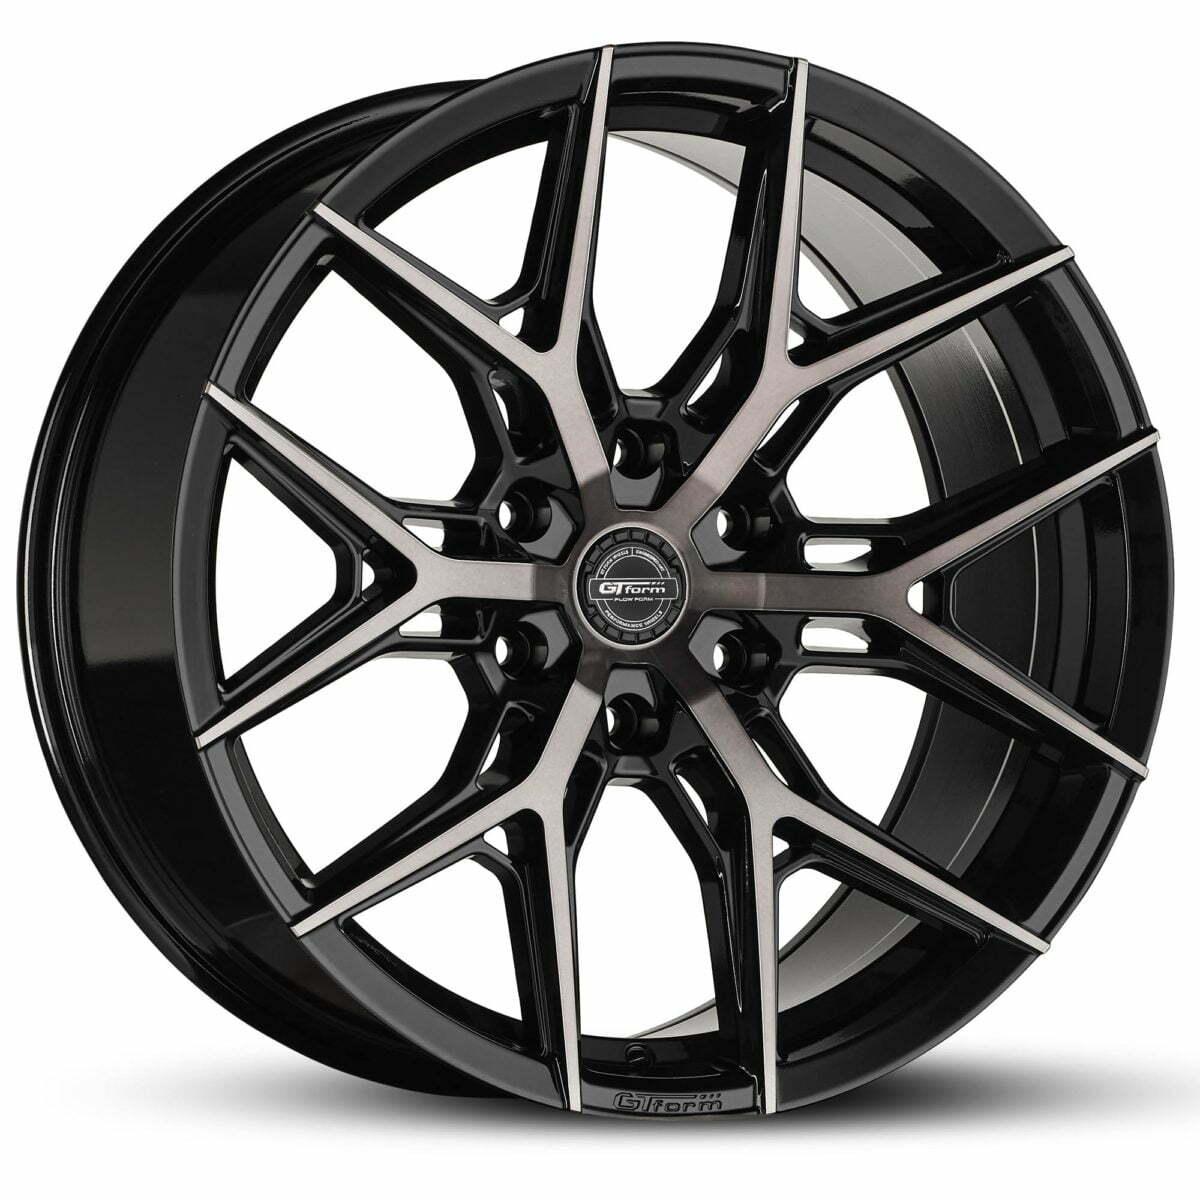 4x4 Wheels GT Form GF-S1 Gloss Black Tinted Wheels 6x139.7 rims